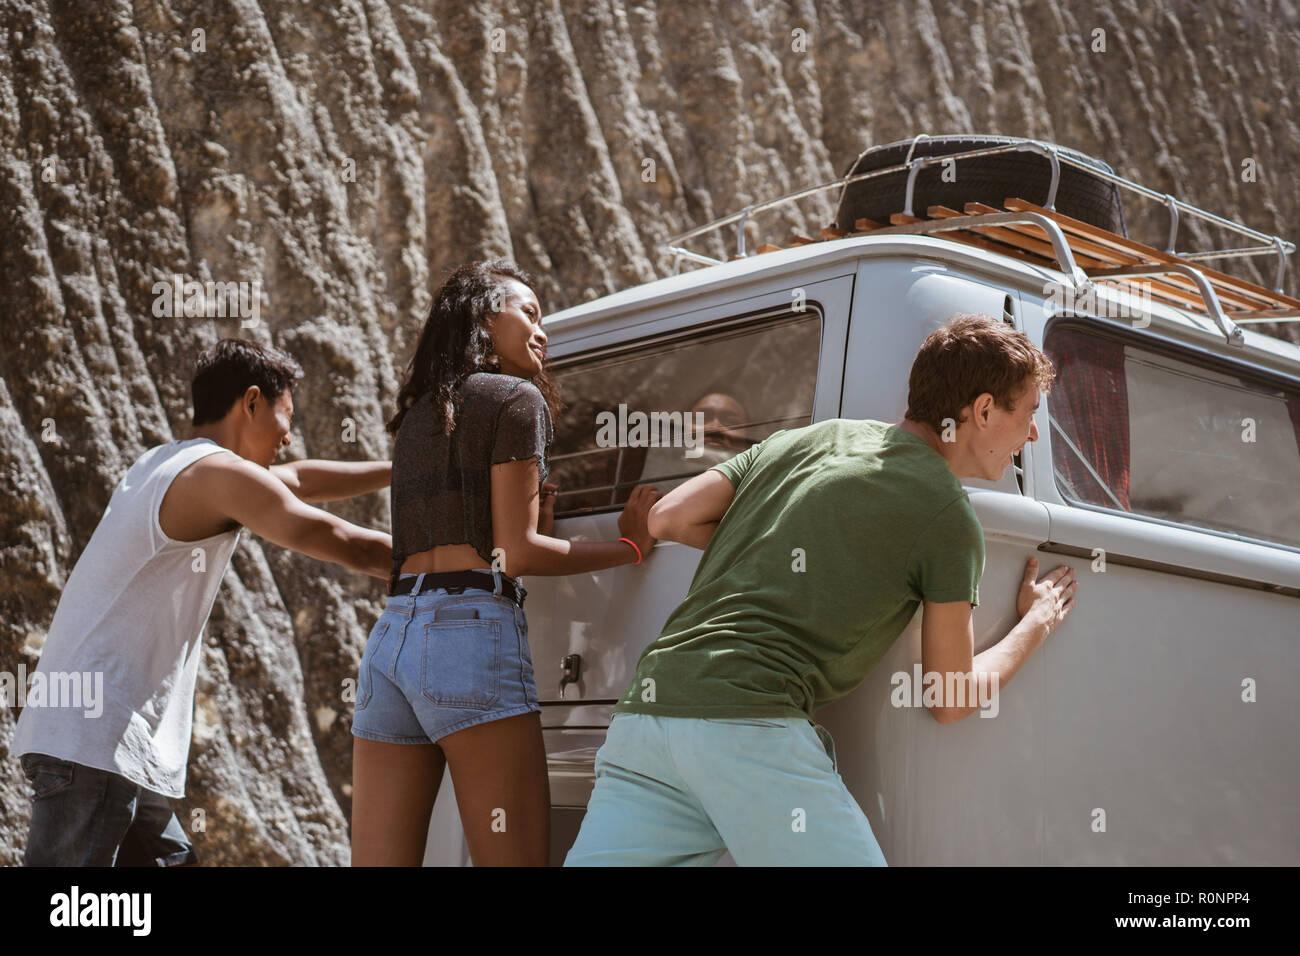 young people push broke down retro van - Stock Image